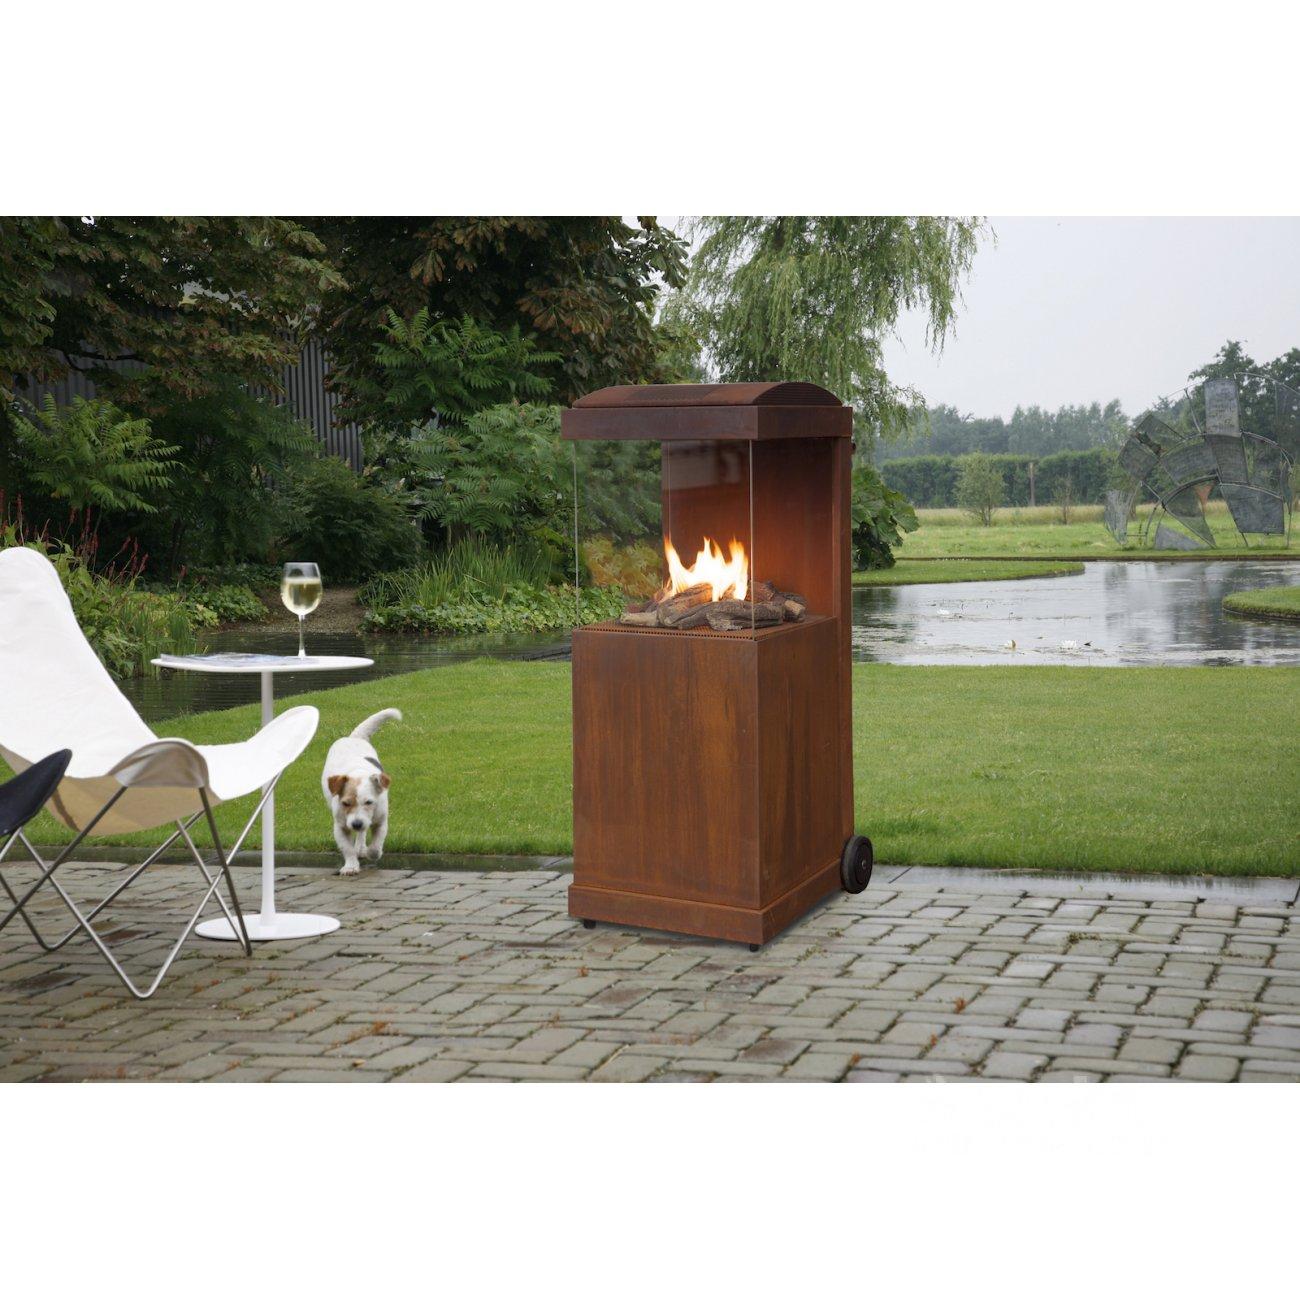 stahl aussenkamin thebuzz. Black Bedroom Furniture Sets. Home Design Ideas